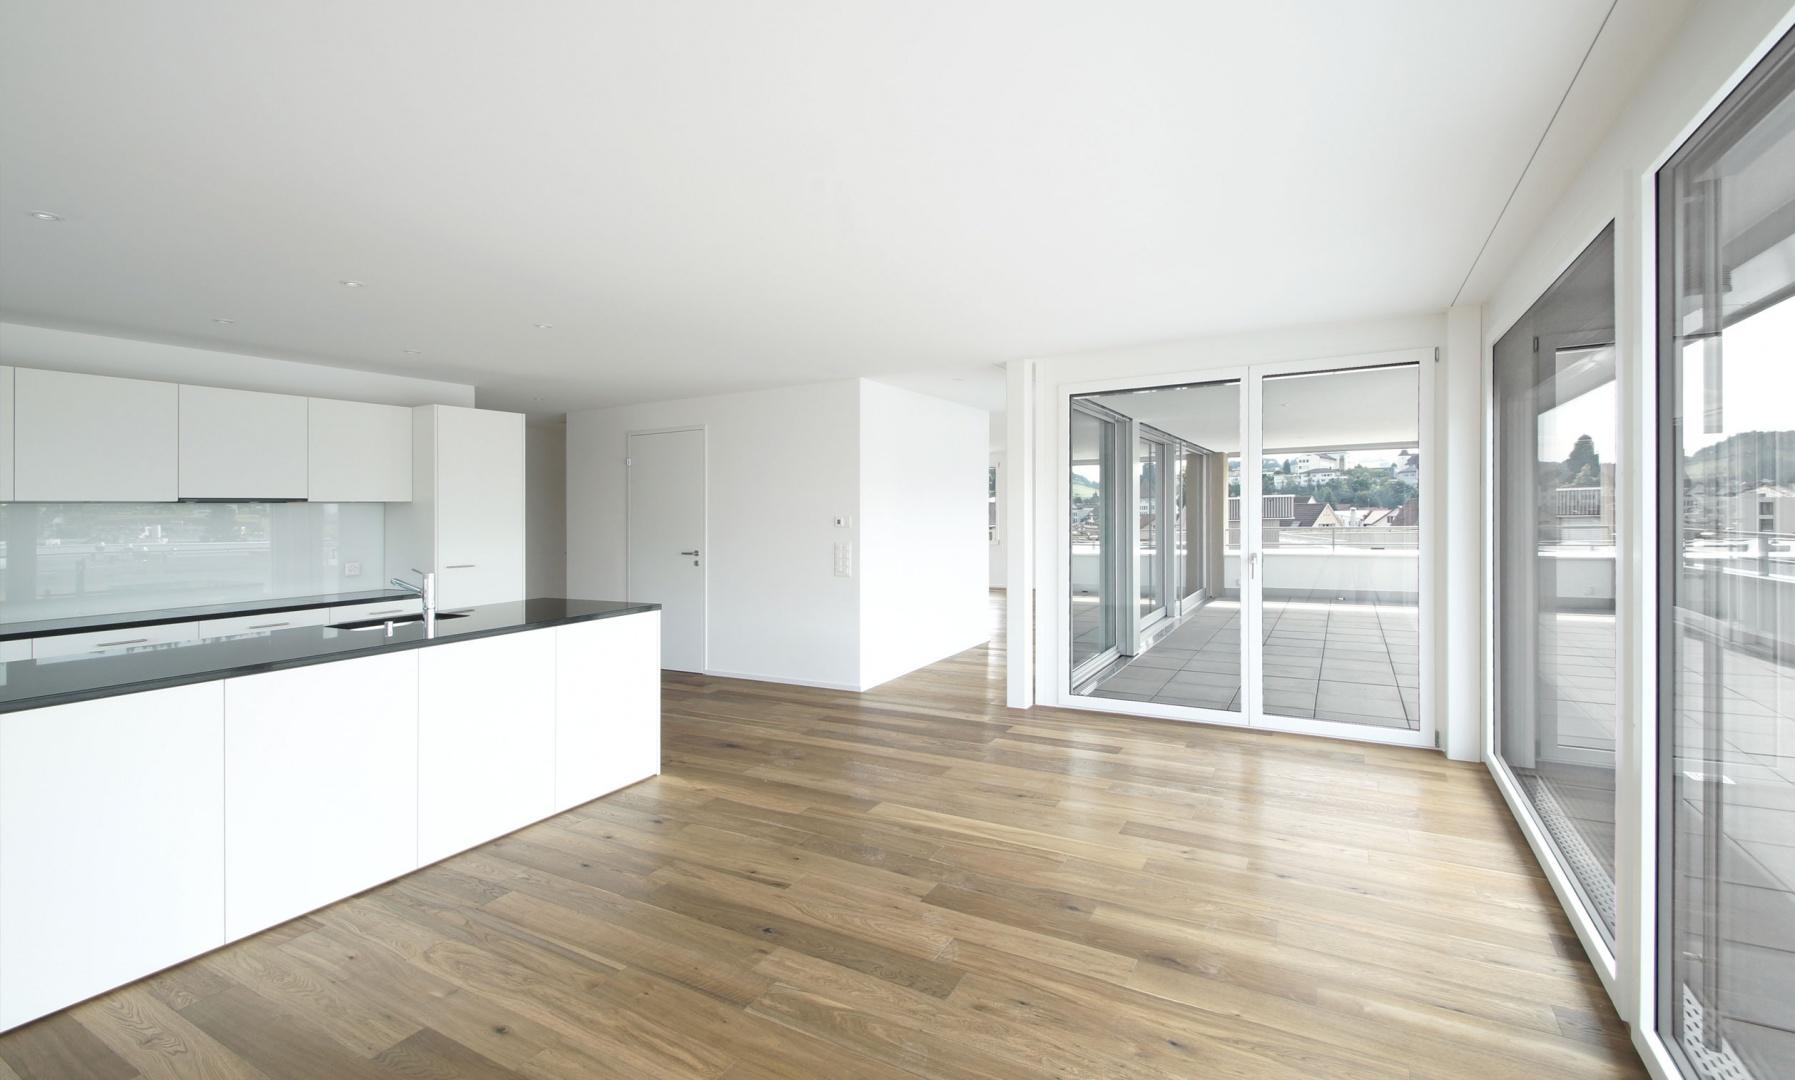 berbauung areal gerbi schweizer baudokumentation. Black Bedroom Furniture Sets. Home Design Ideas